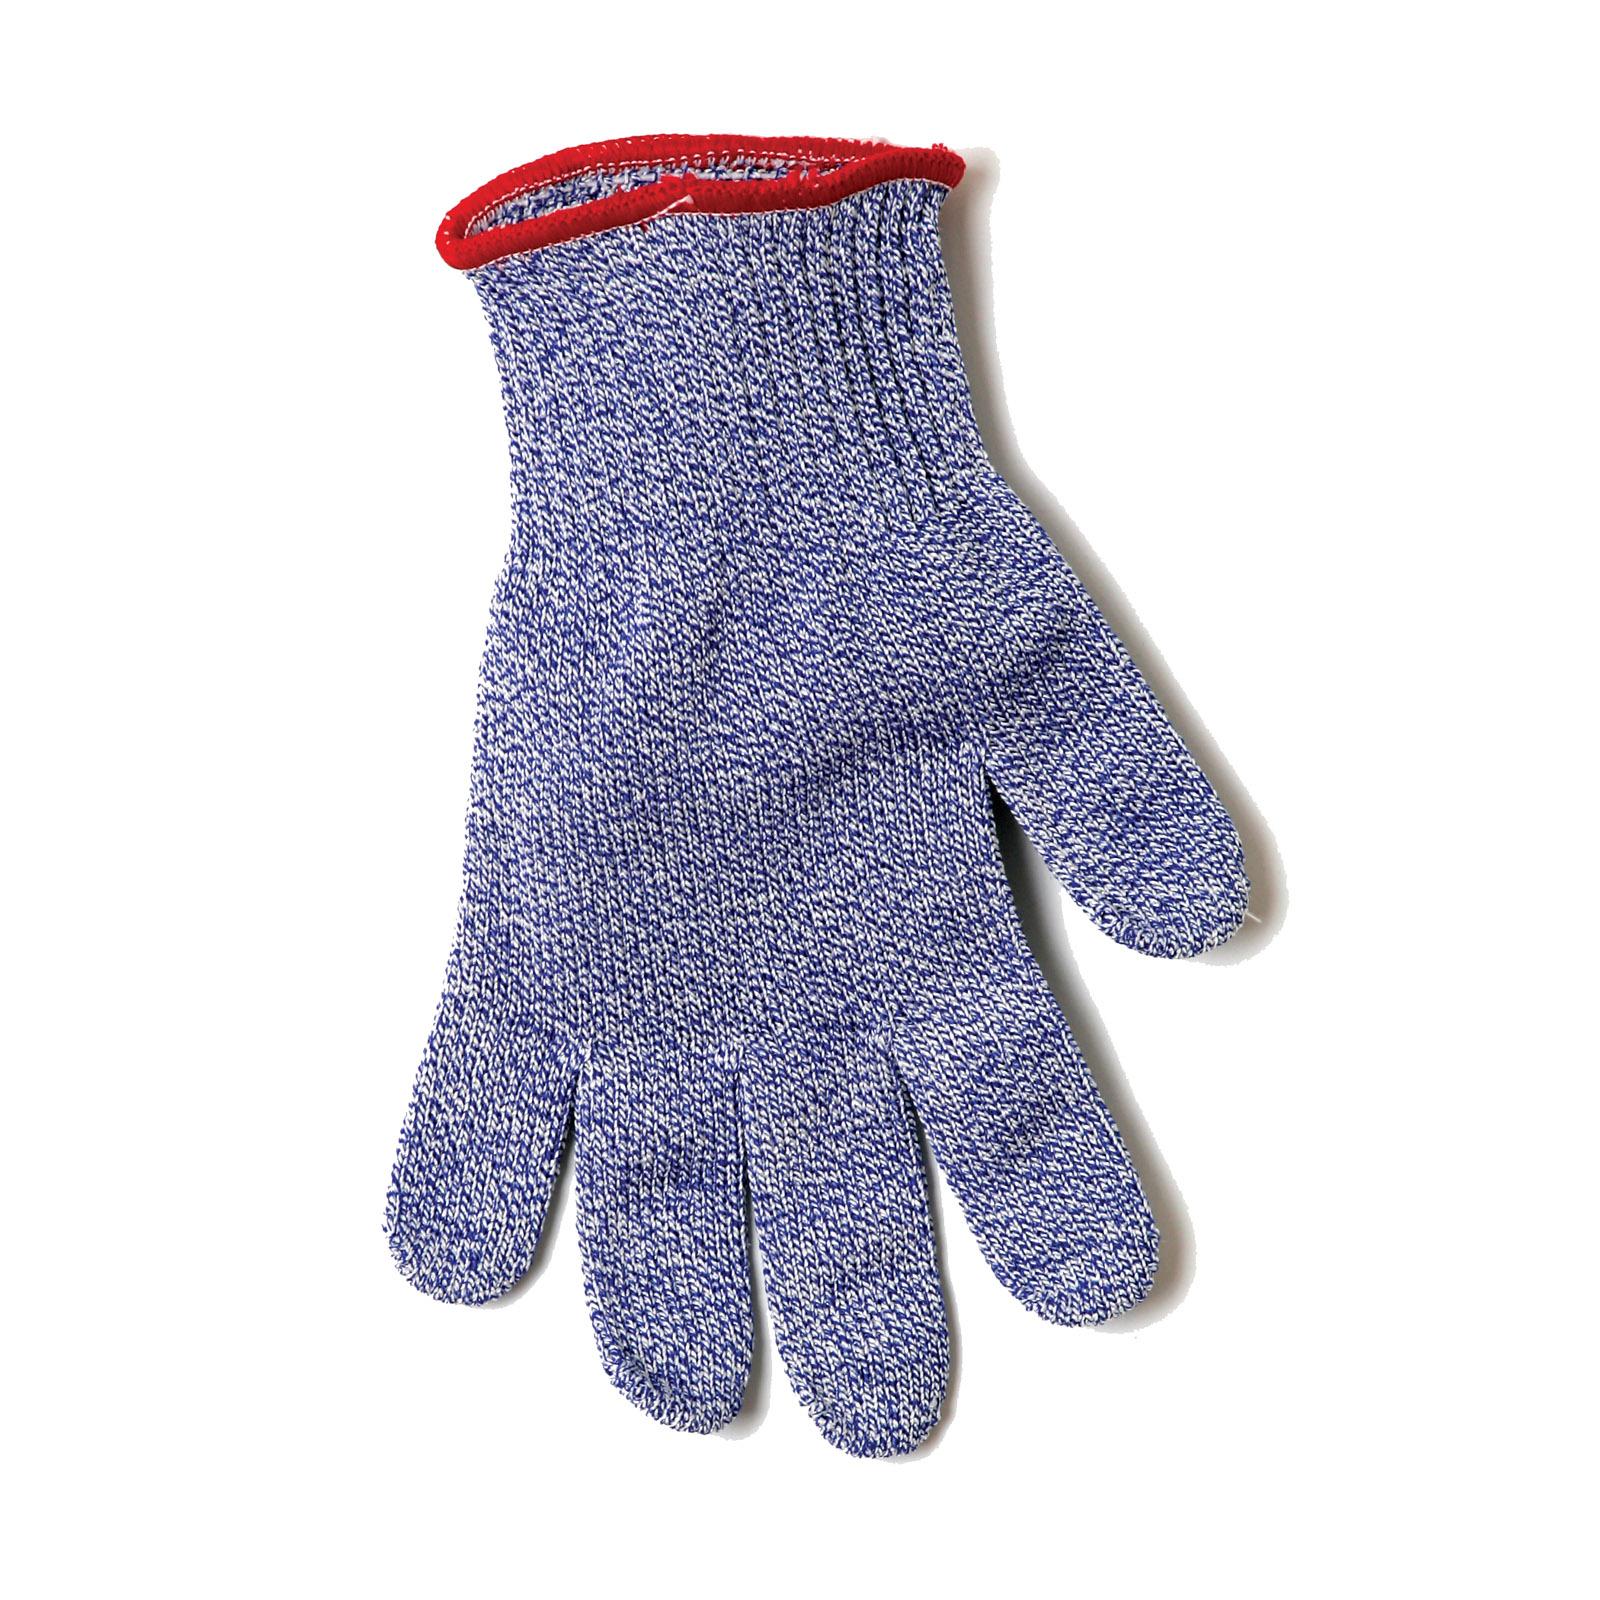 San Jamar SG10-BL-S glove, cut resistant